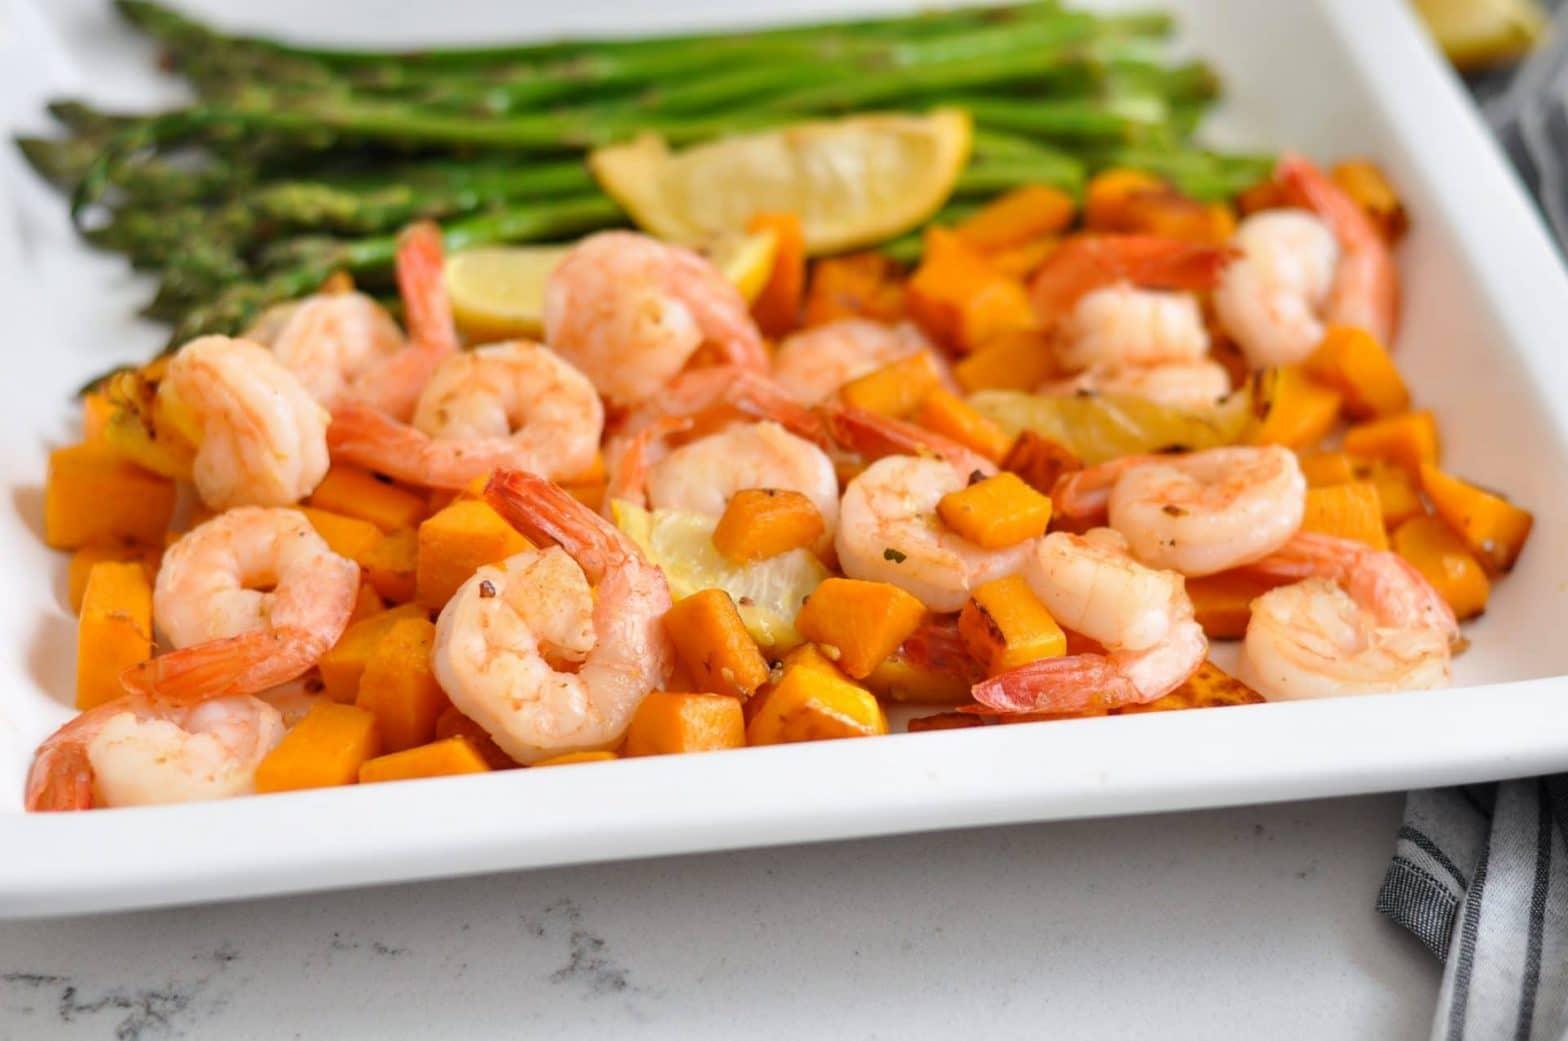 Shrimp and Squash Skillet 30 Minute Meal (Whole30 + Paleo)